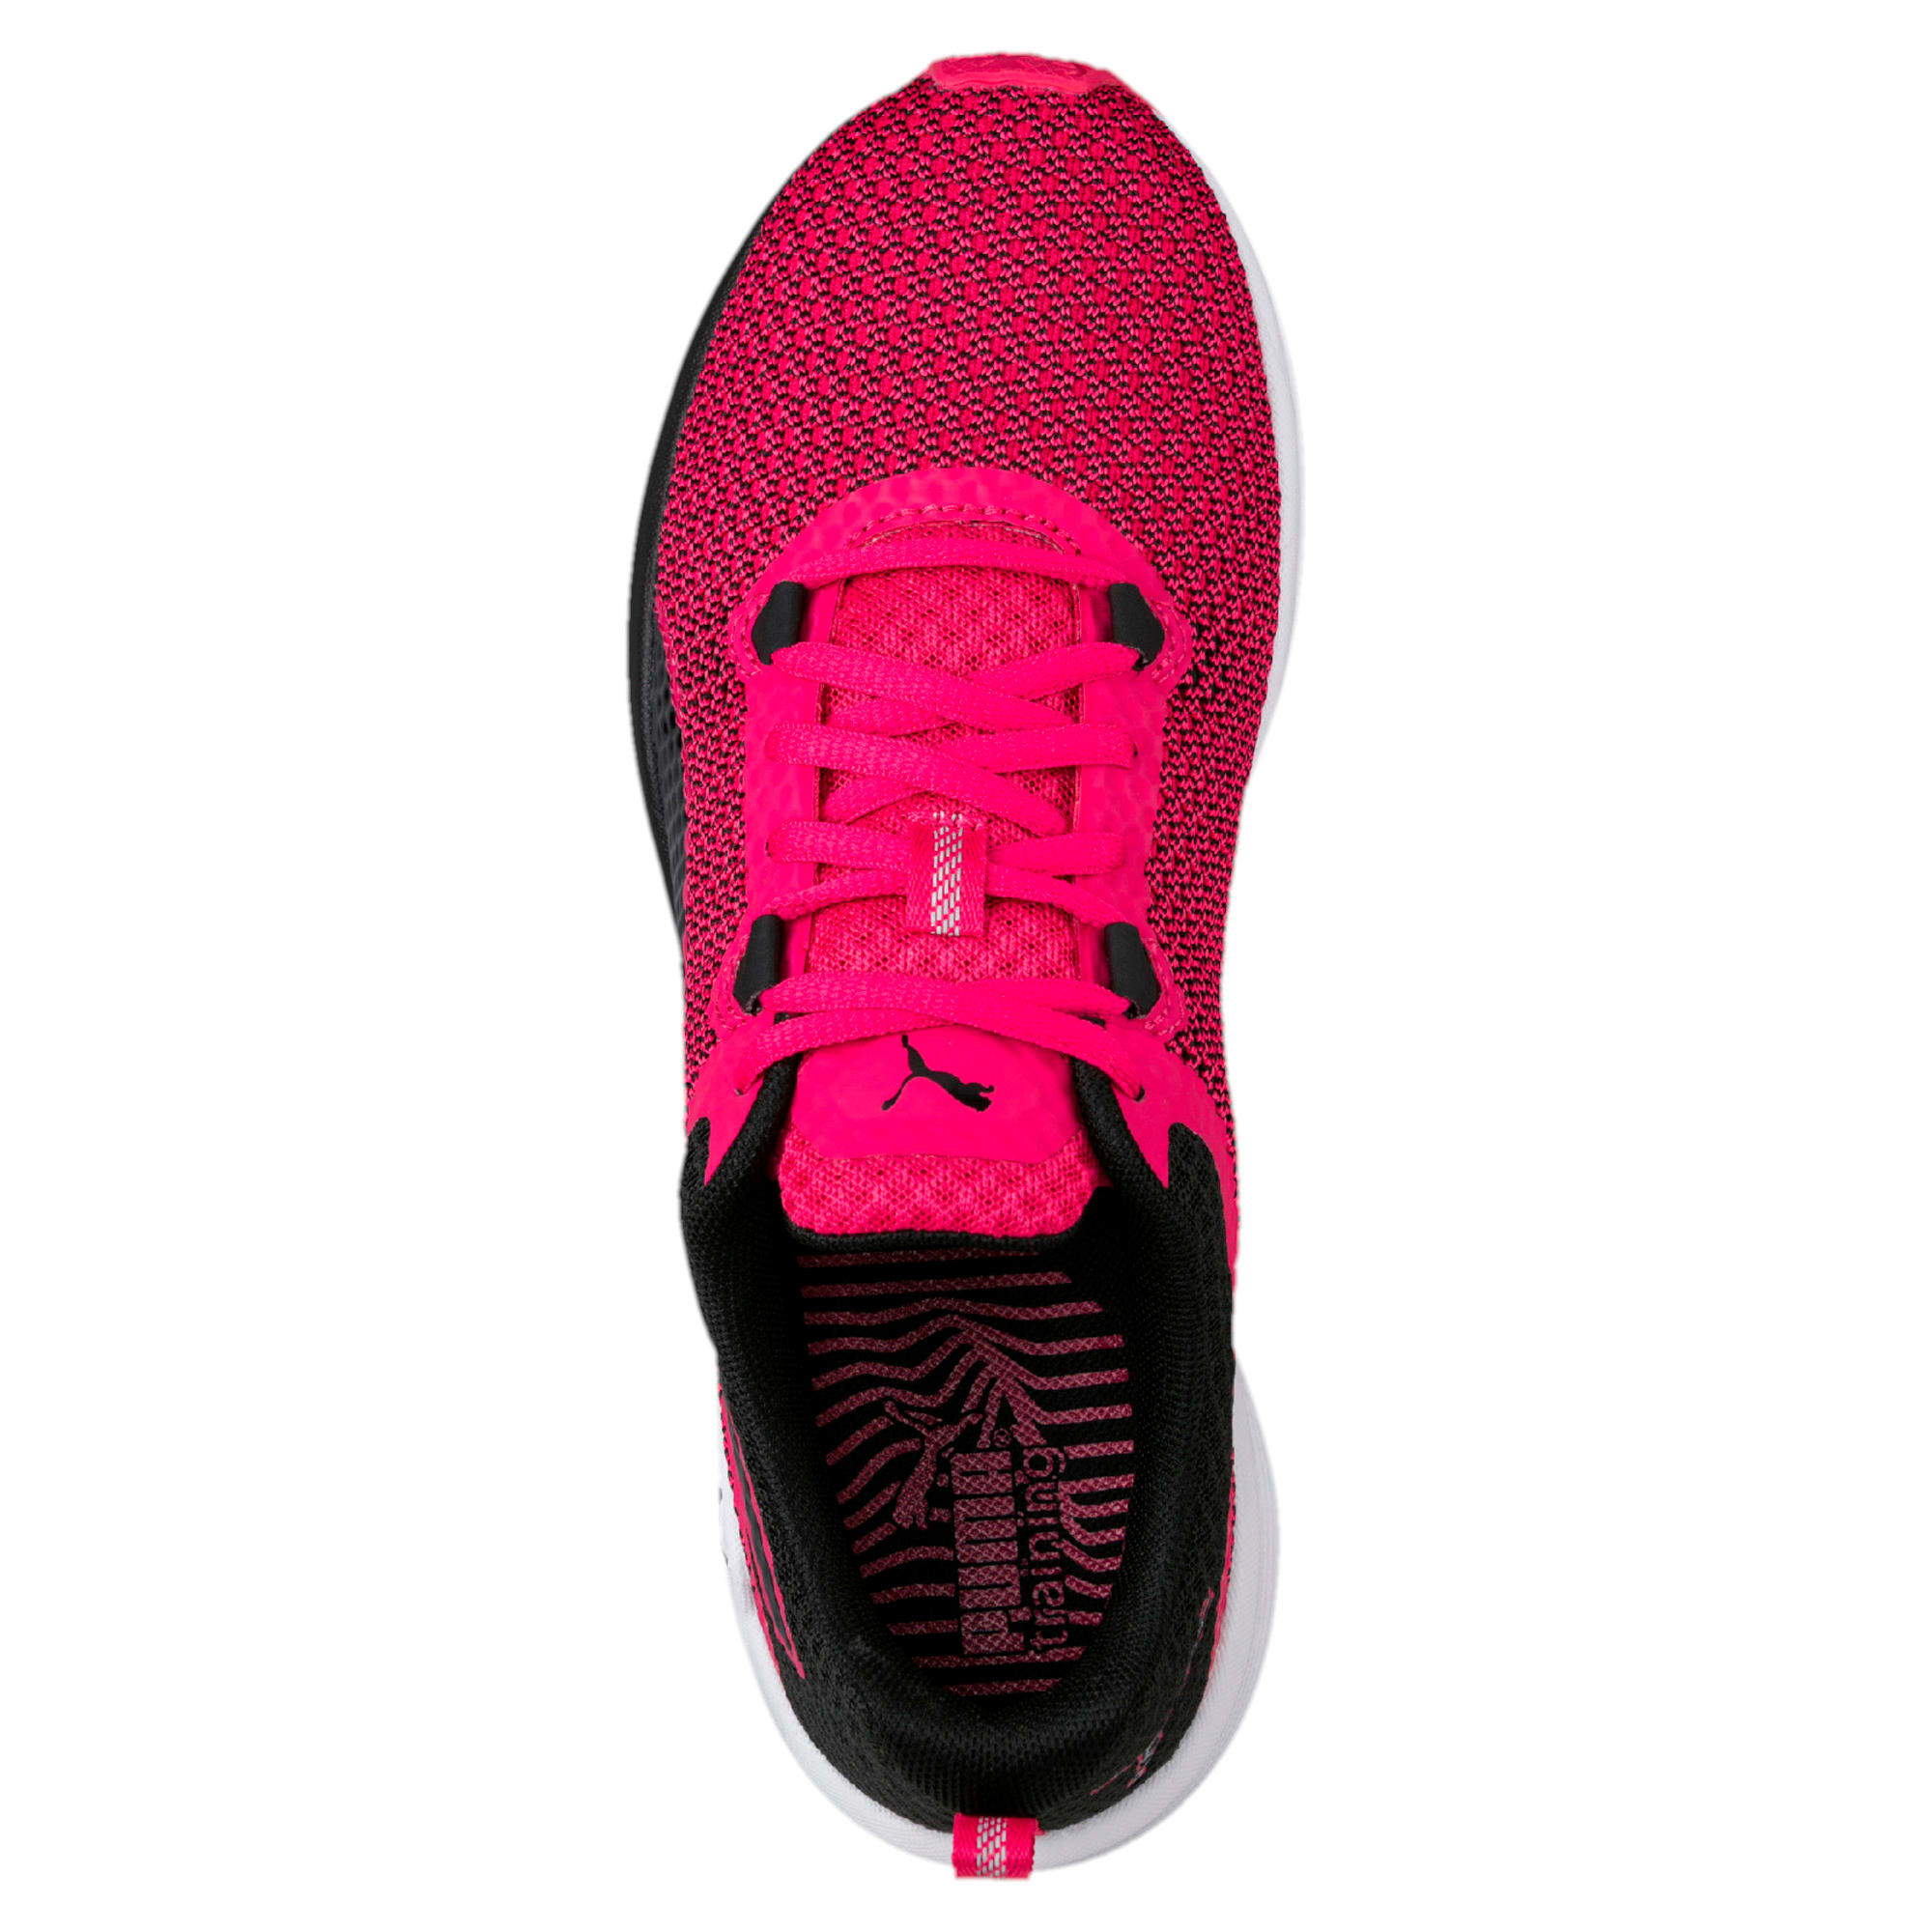 Thumbnail 4 of Pulse IGNITE XT Women's Training Shoes, Love Potion-Puma Black, medium-IND